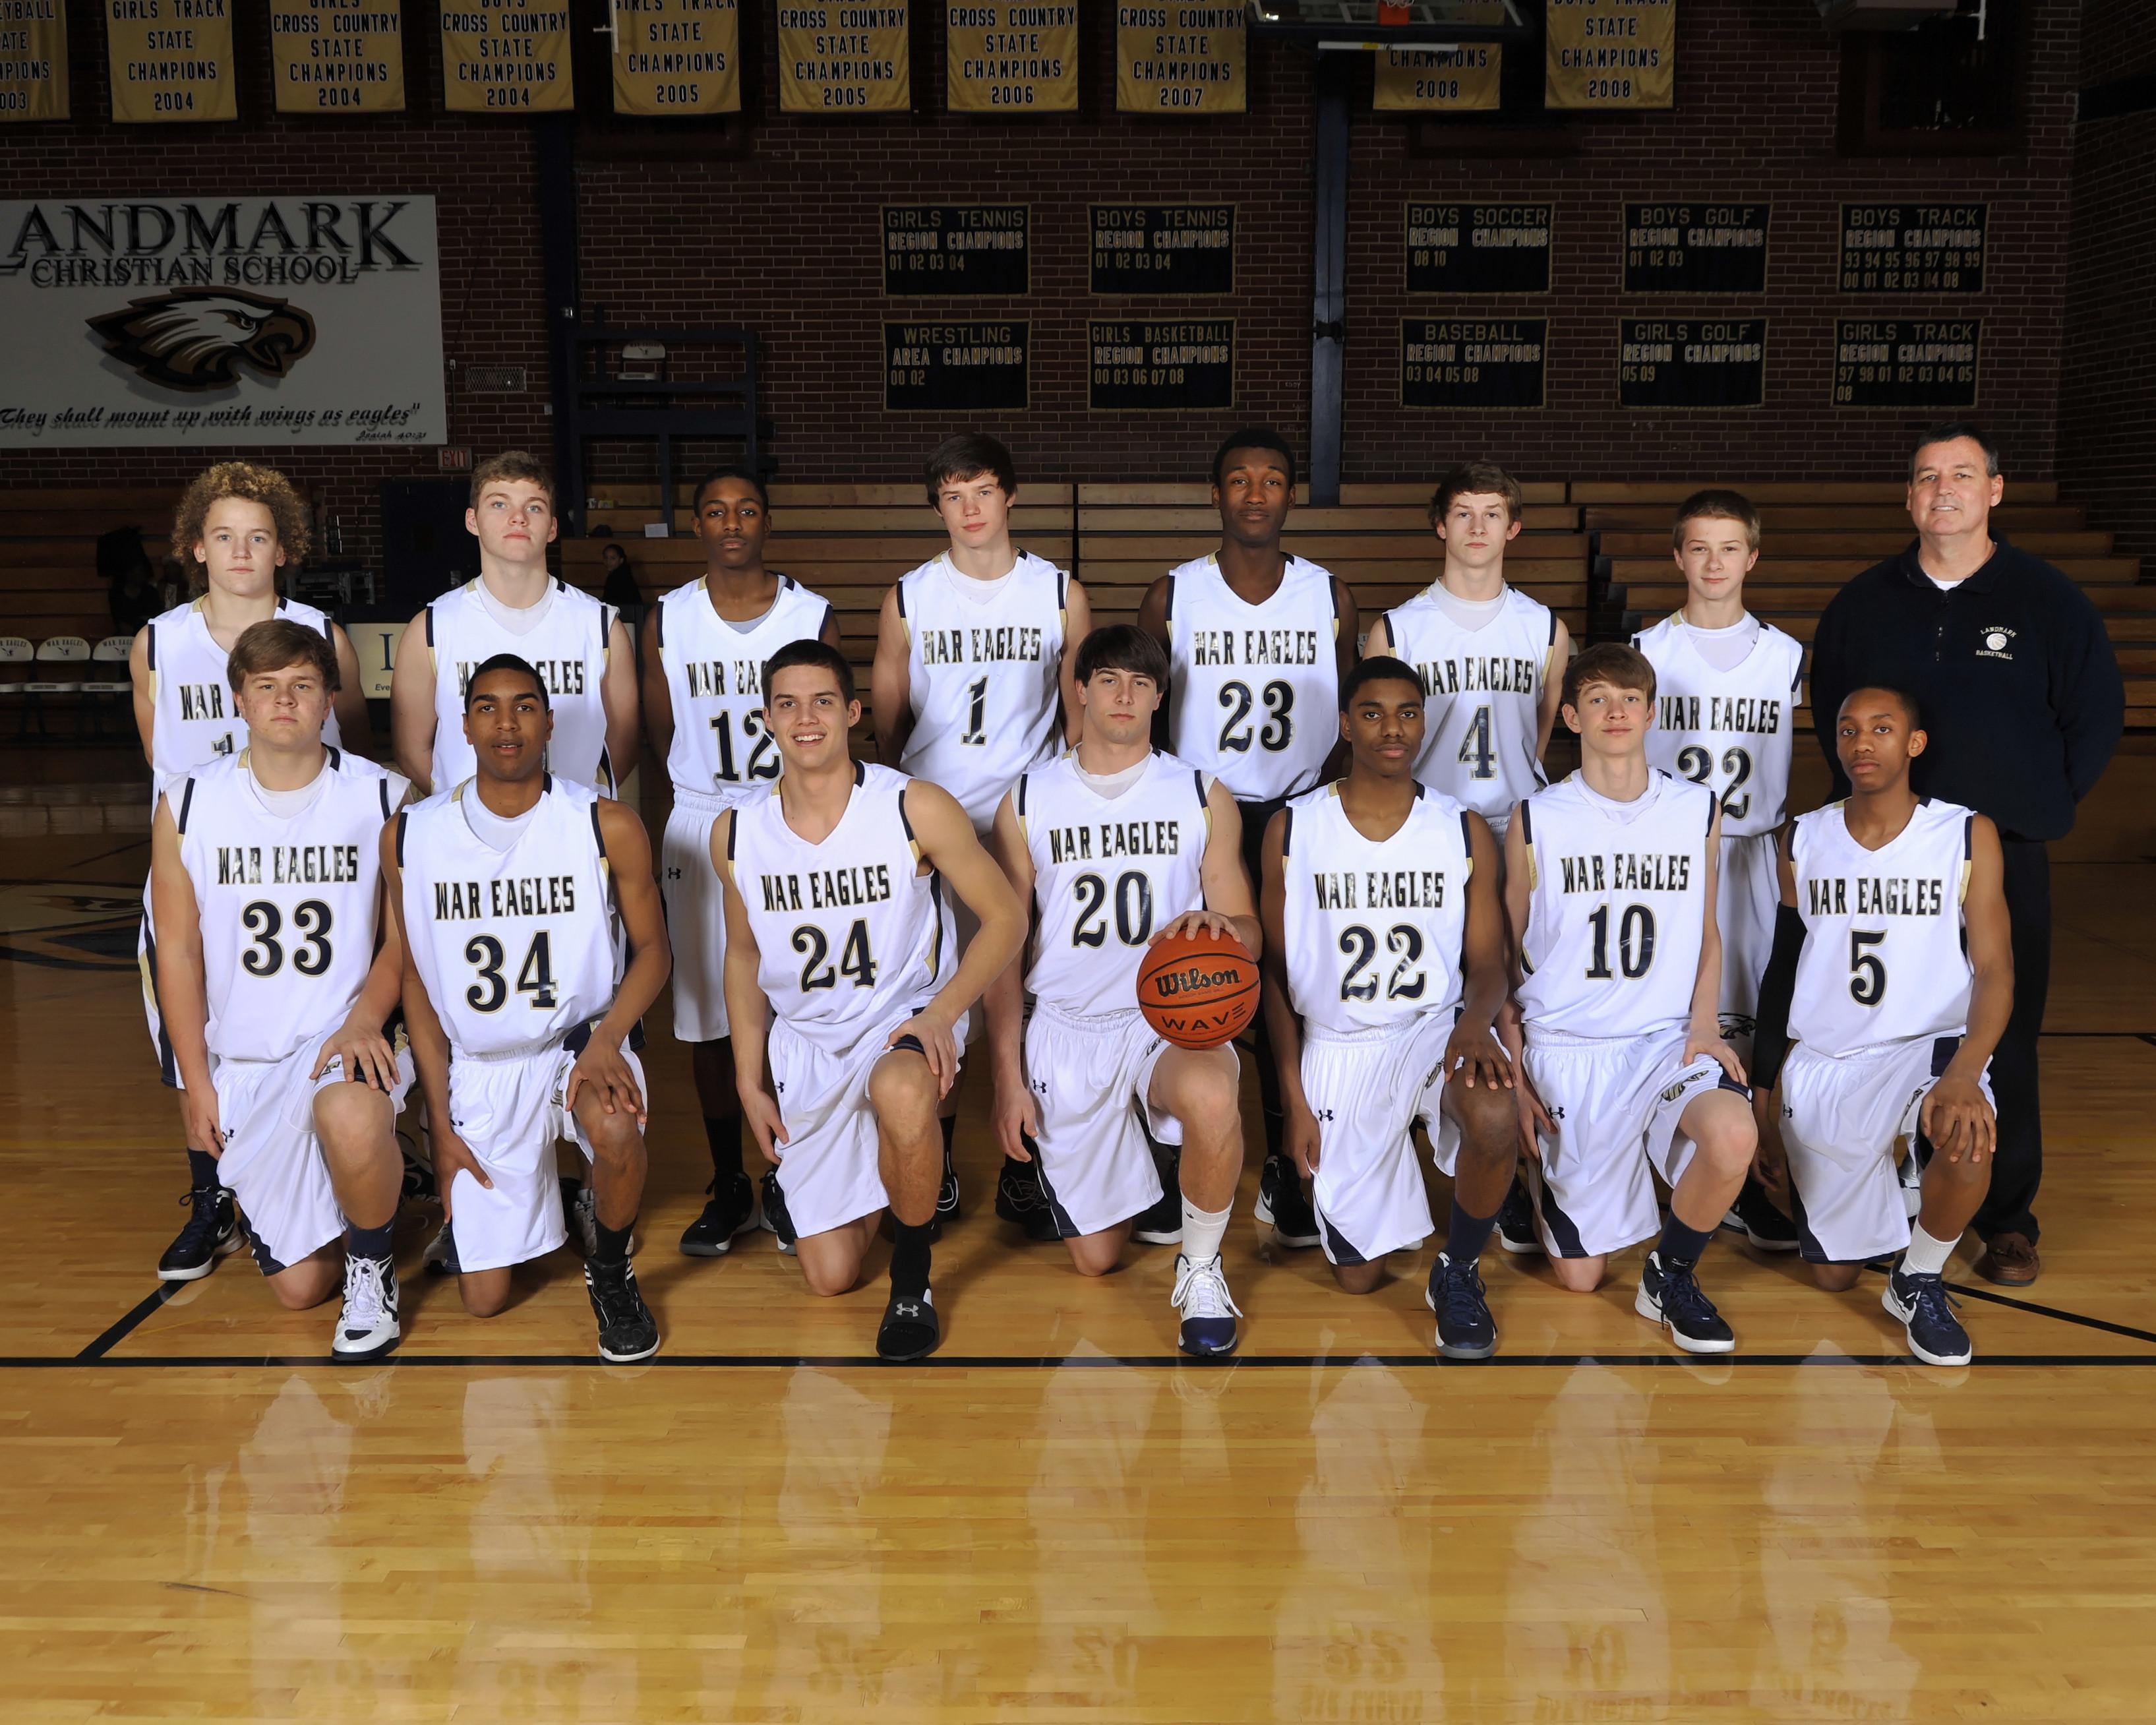 John Holleman Basketball V Bb Team